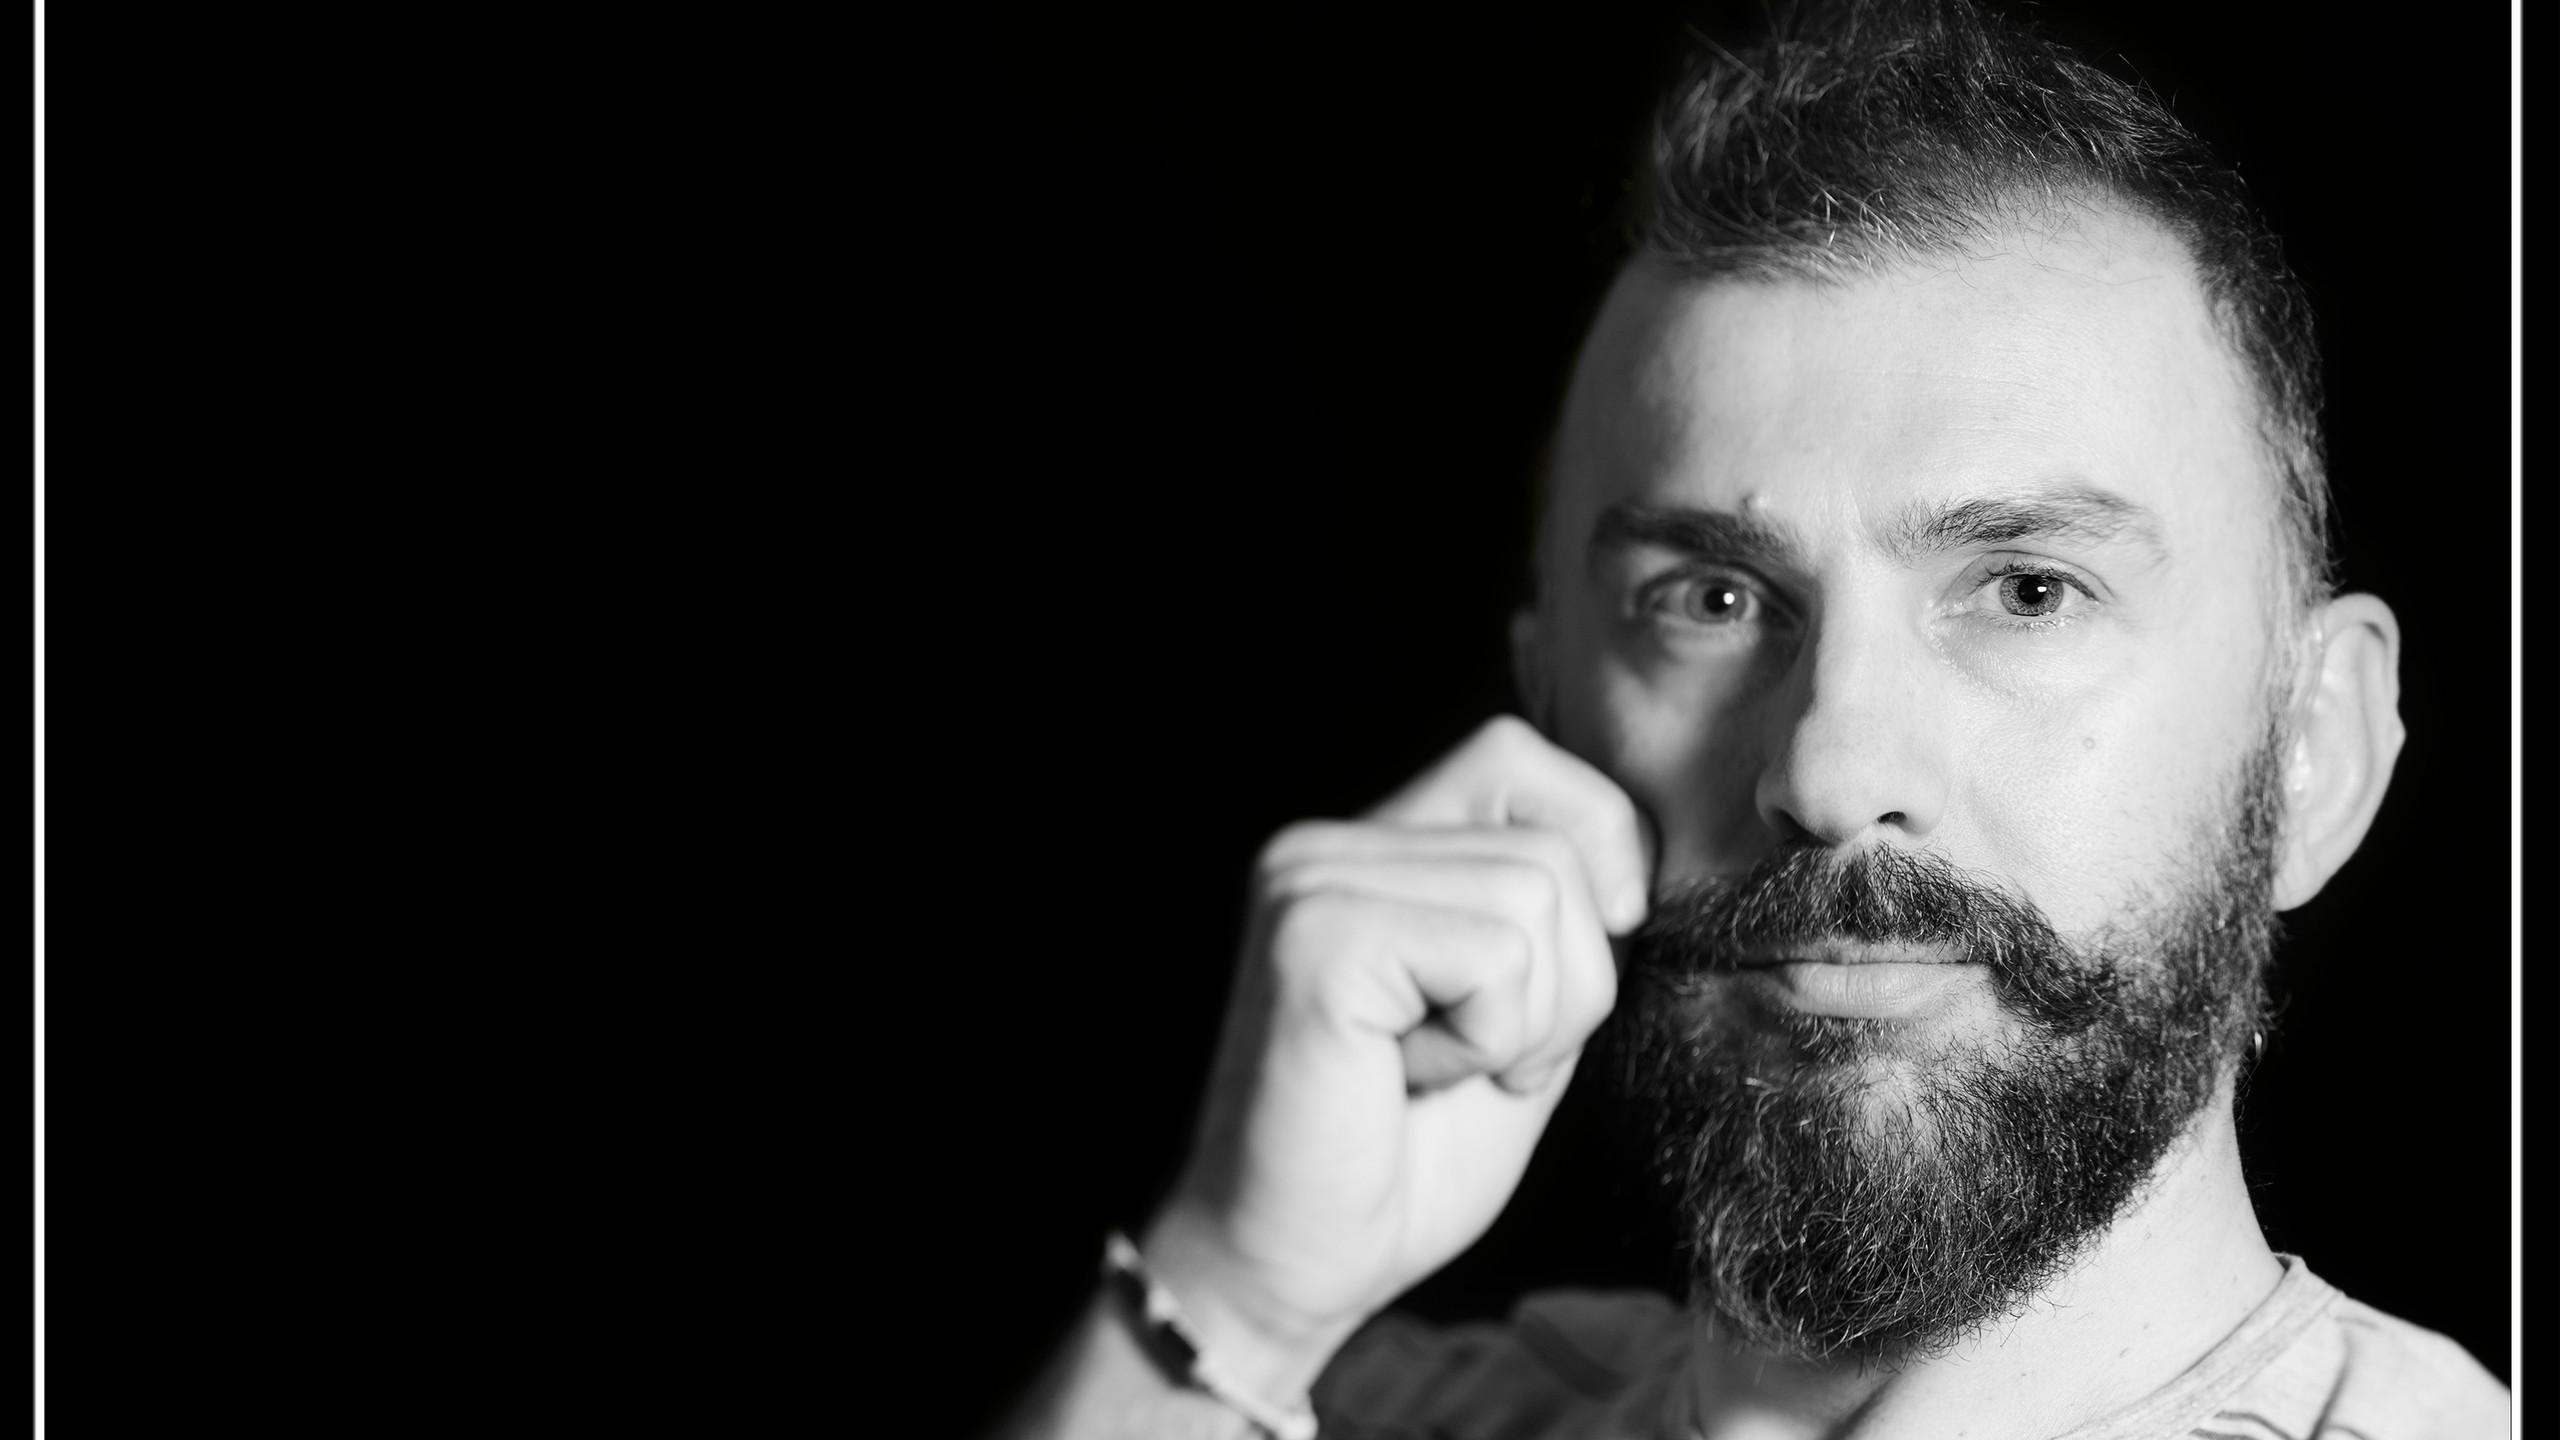 Vassilis Tsoukalas